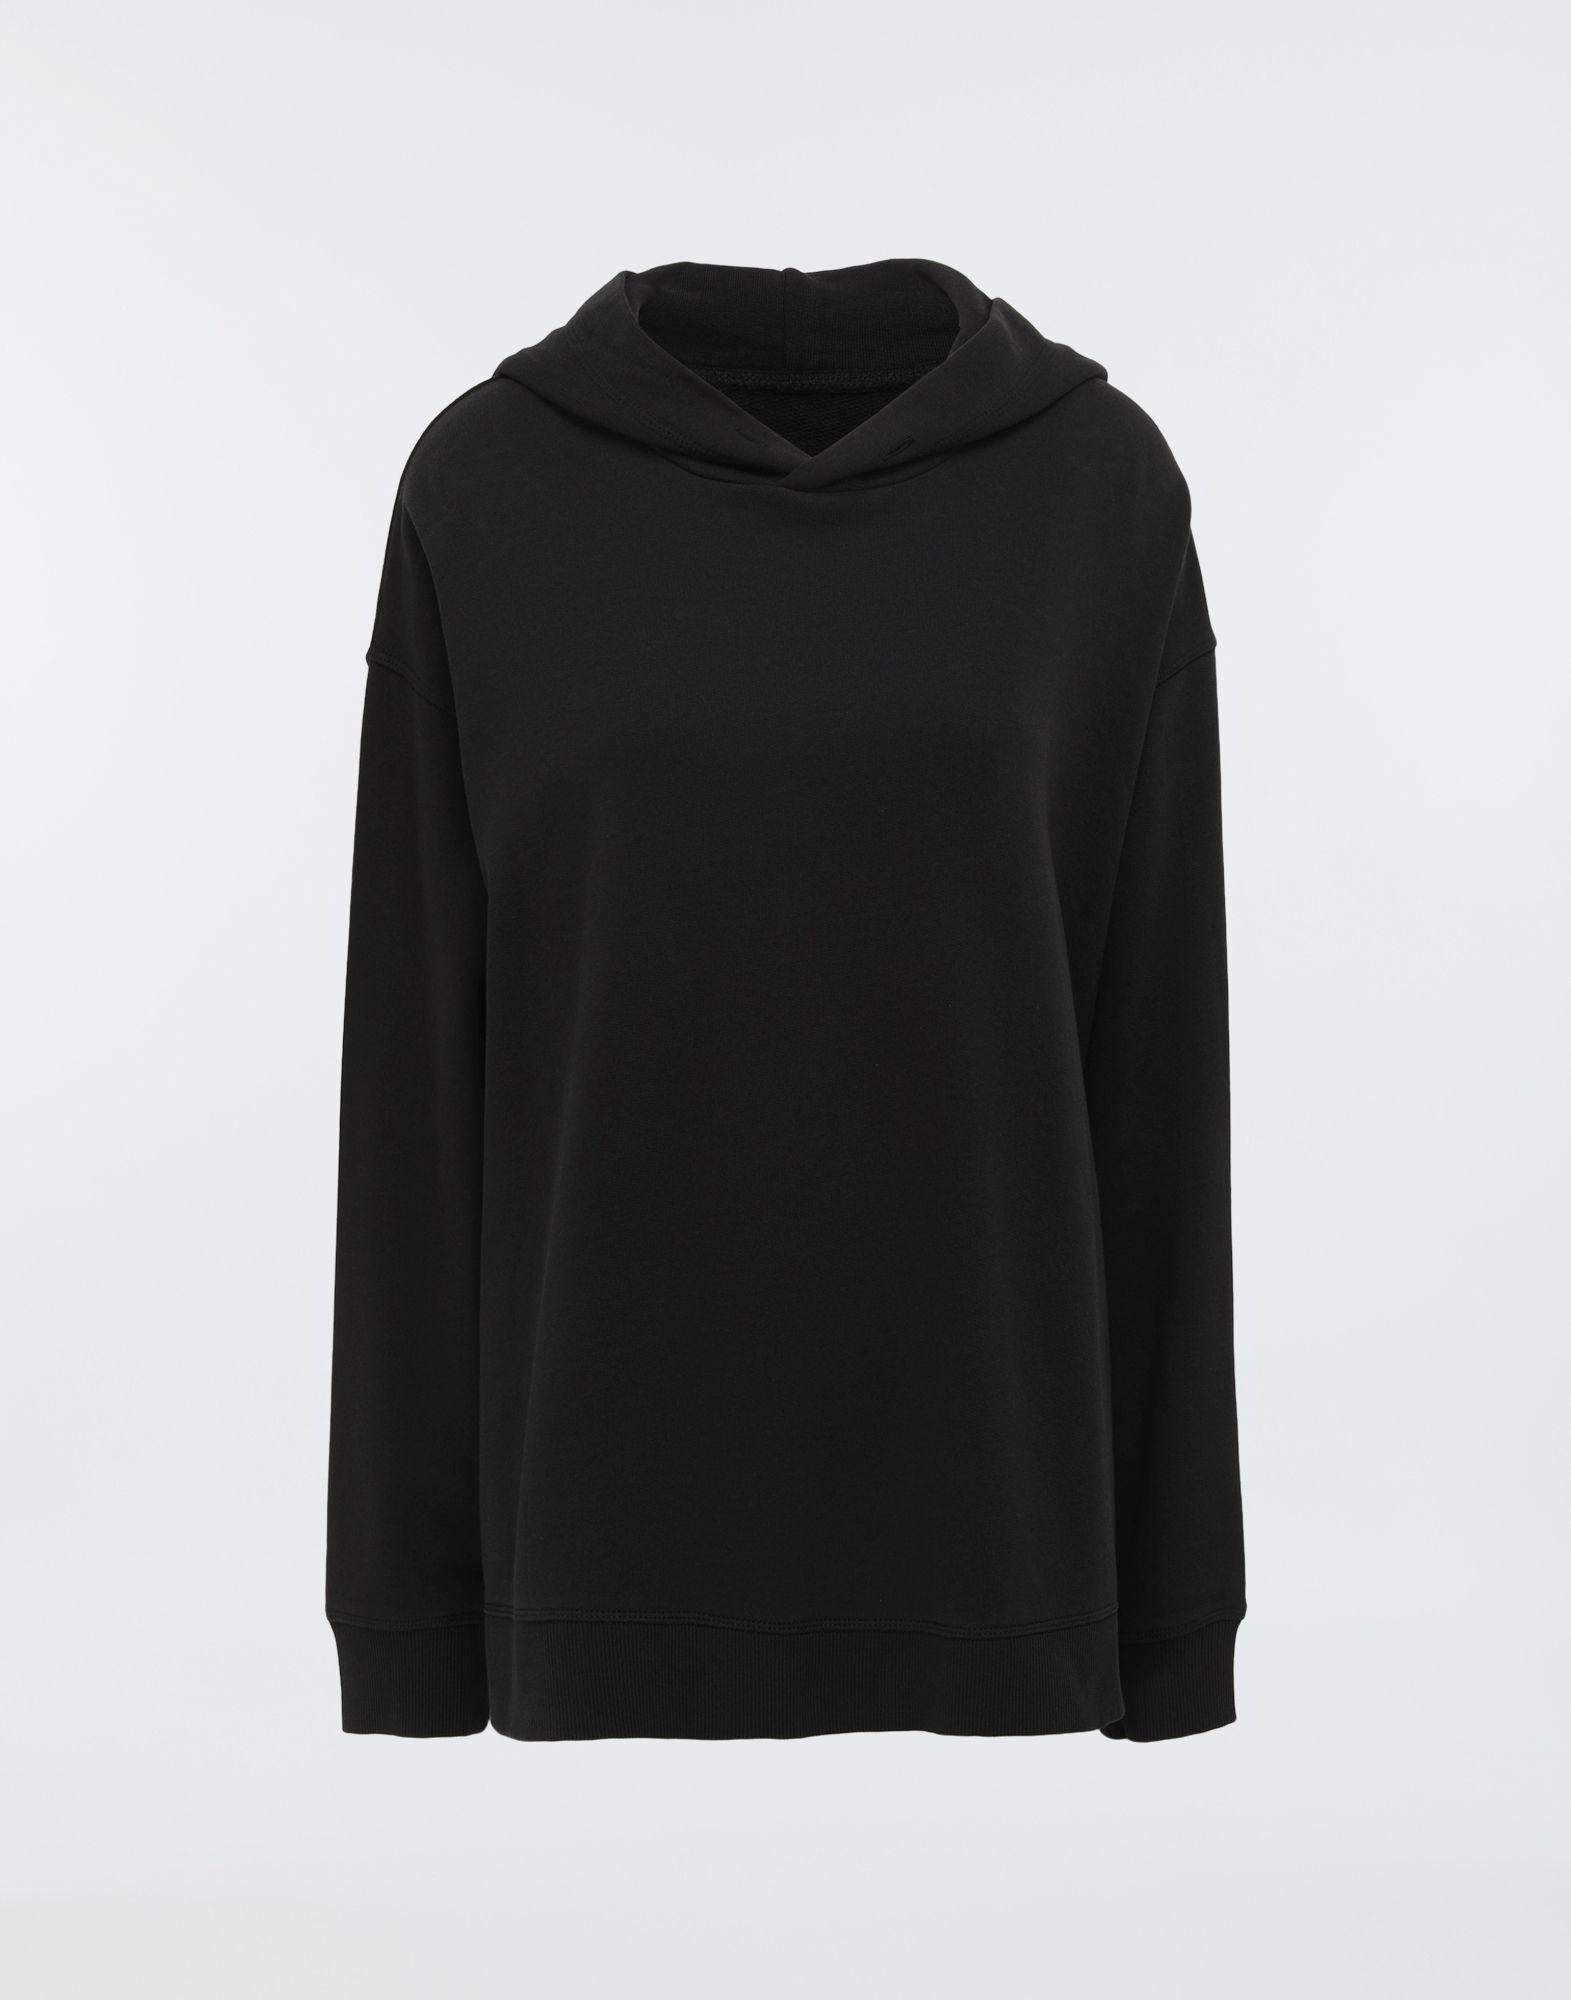 11ed0b046b MM6 by Maison Martin Margiela. Women s Black Logo-print Hooded Sweatshirt